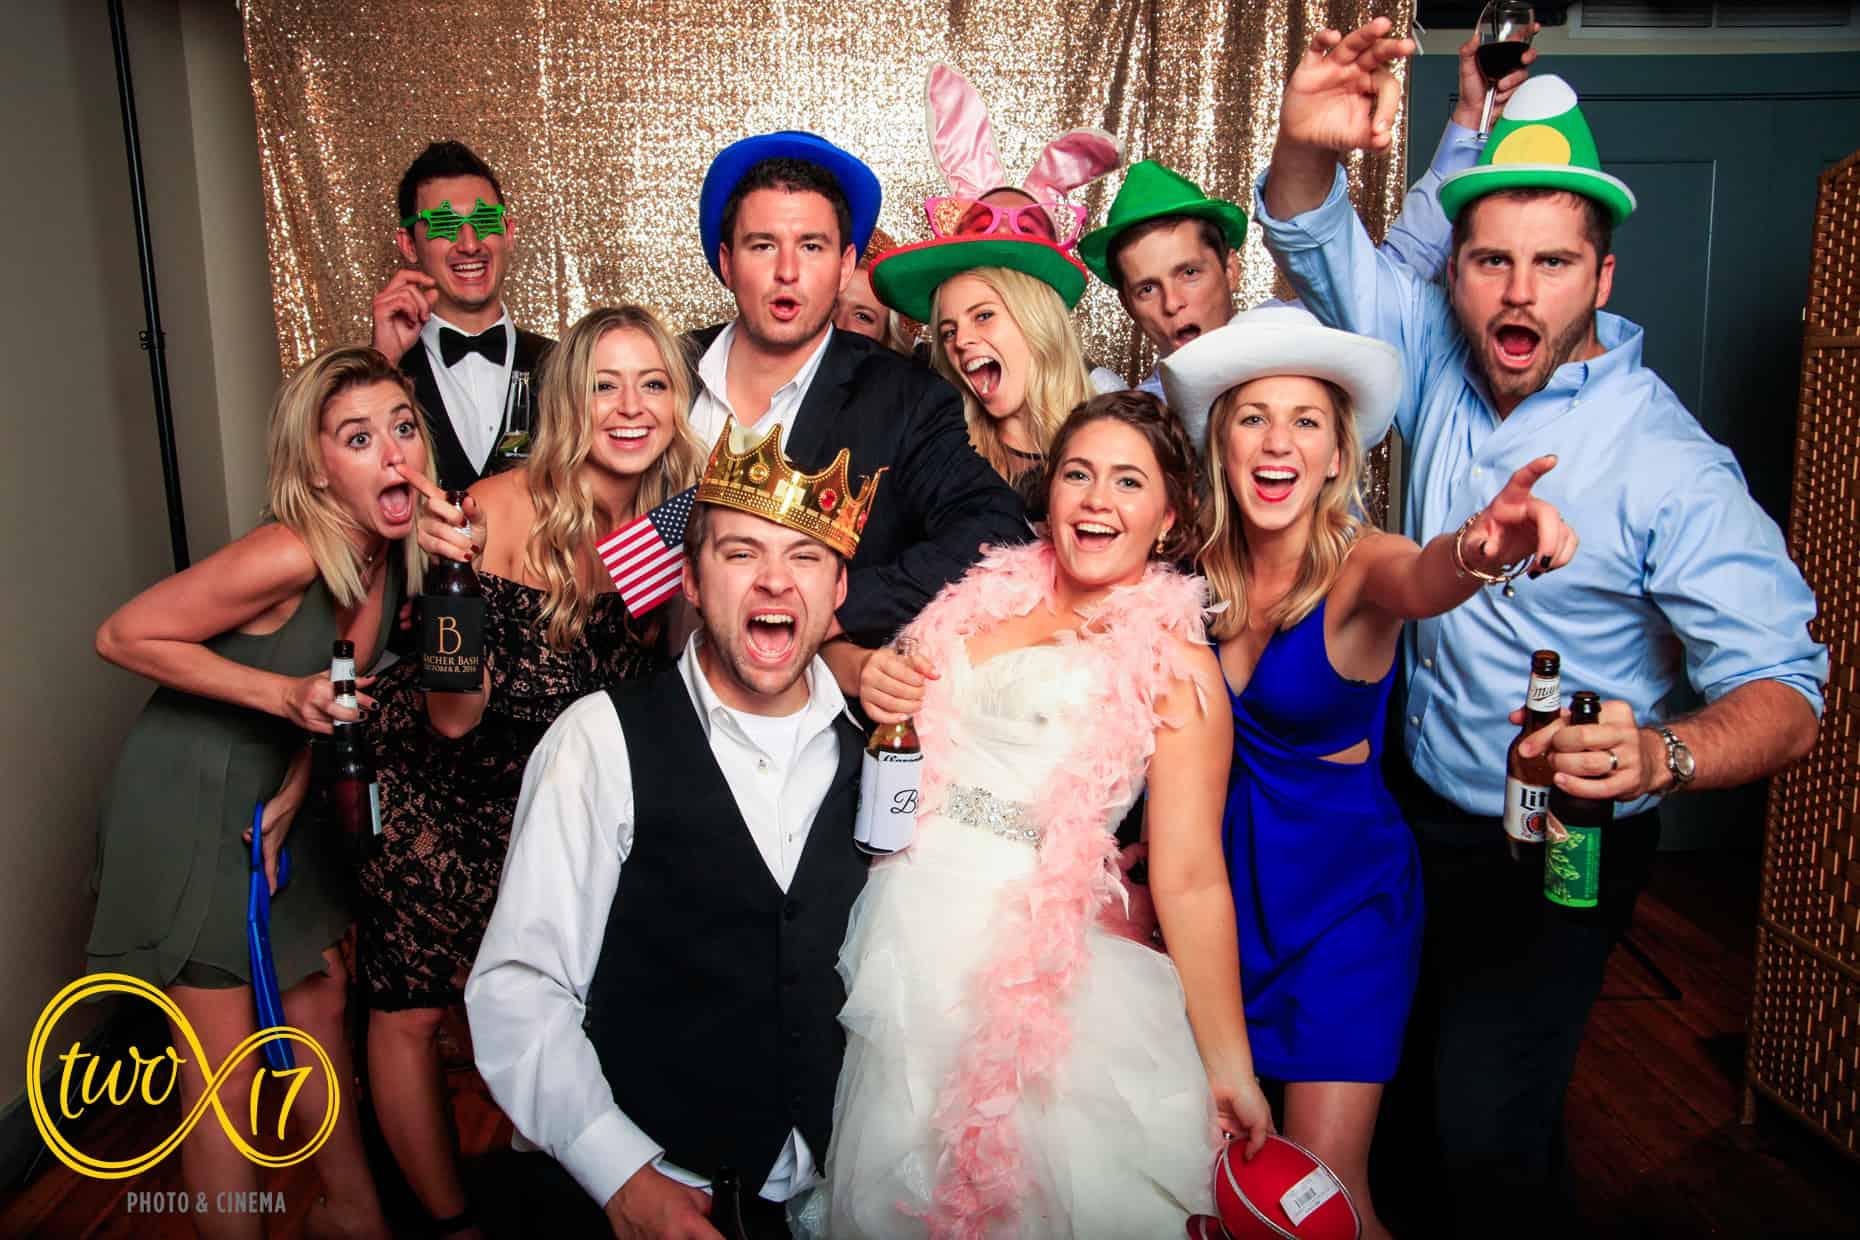 Philadelphia Wedding Photo Booth Rental